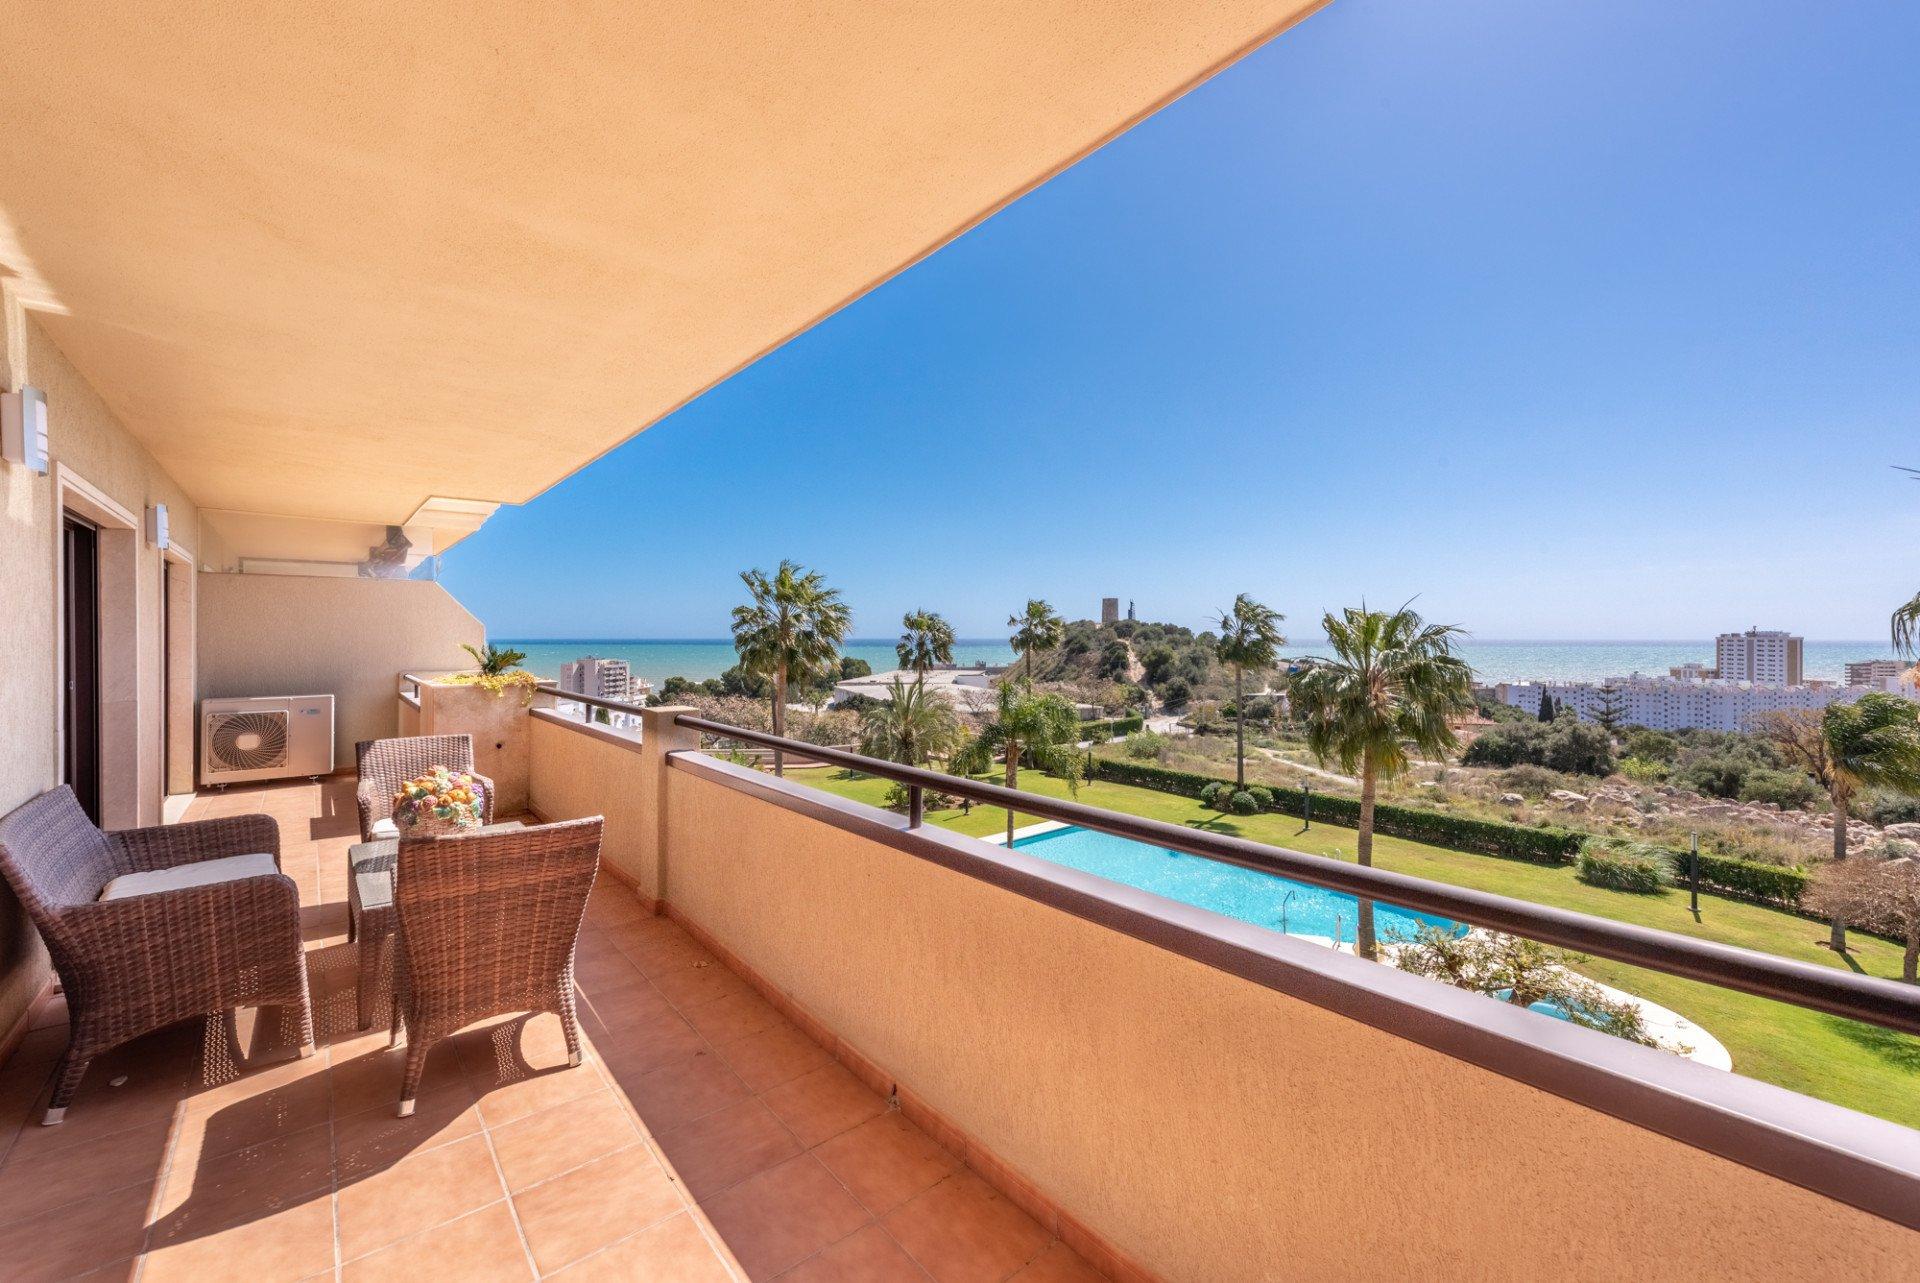 Apartment in Fuengirola, Andalusia, Spain 1